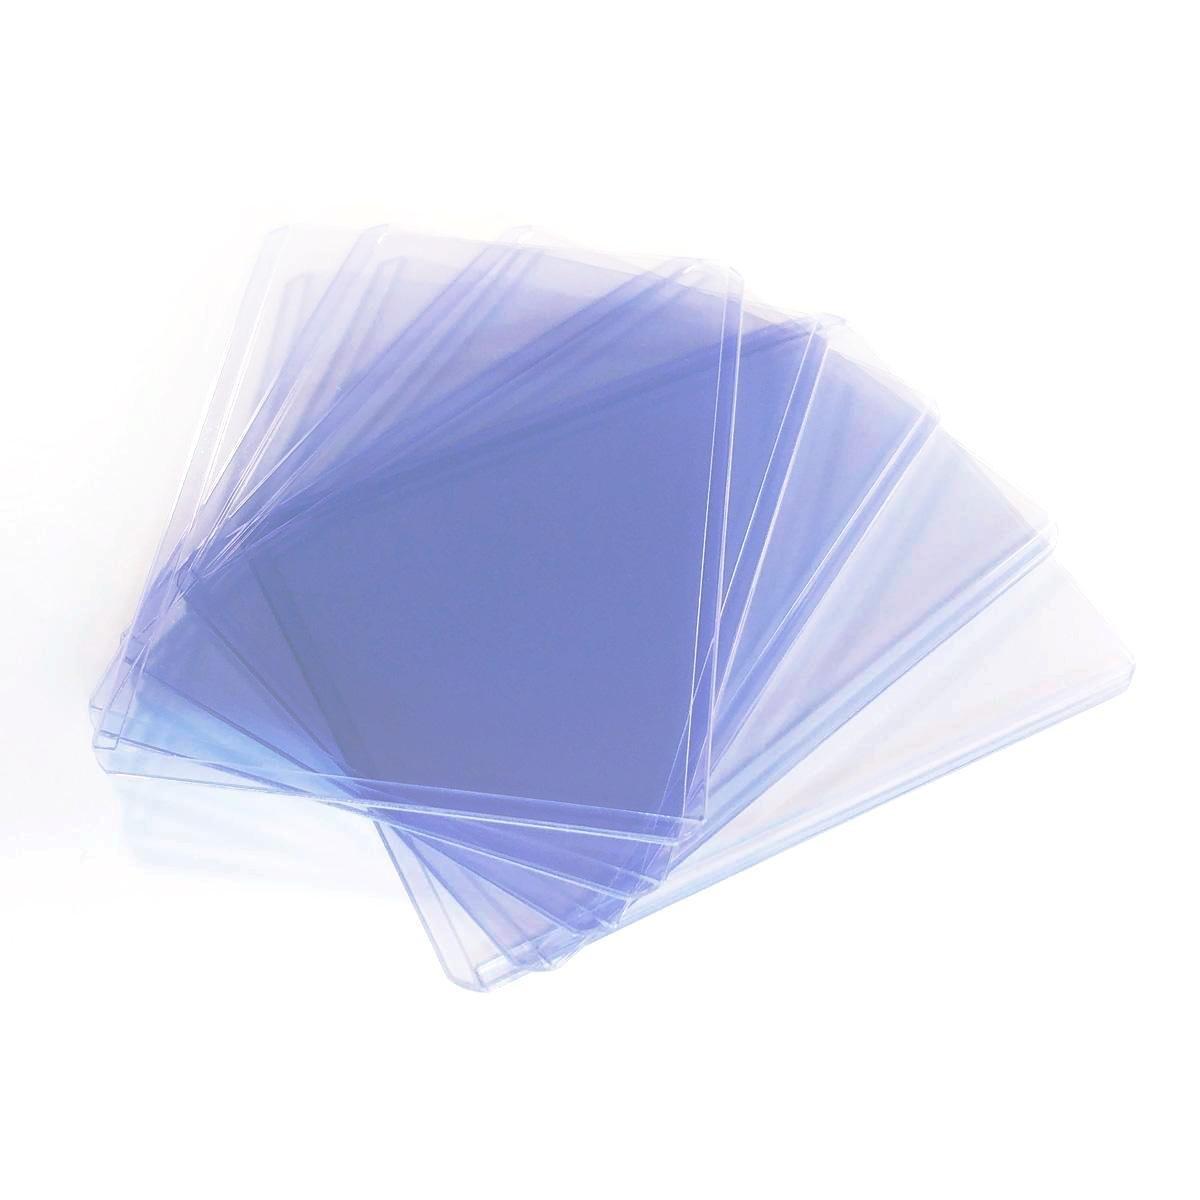 Ultra Pro 3x4 Clear Regular 5